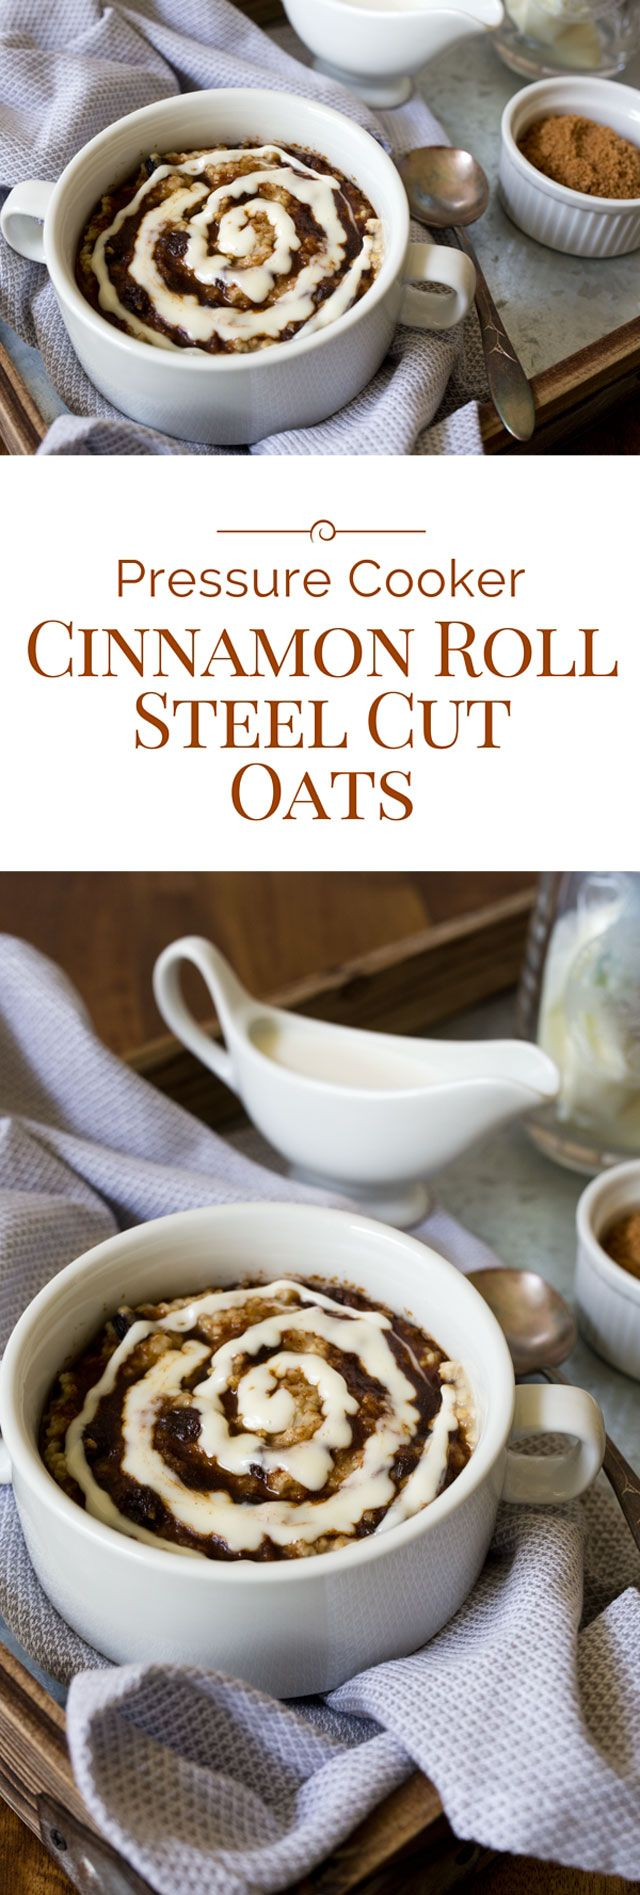 Pressure Cooker Cinnamon Roll Steel Cut Oats #strawberrycinnamonrolls